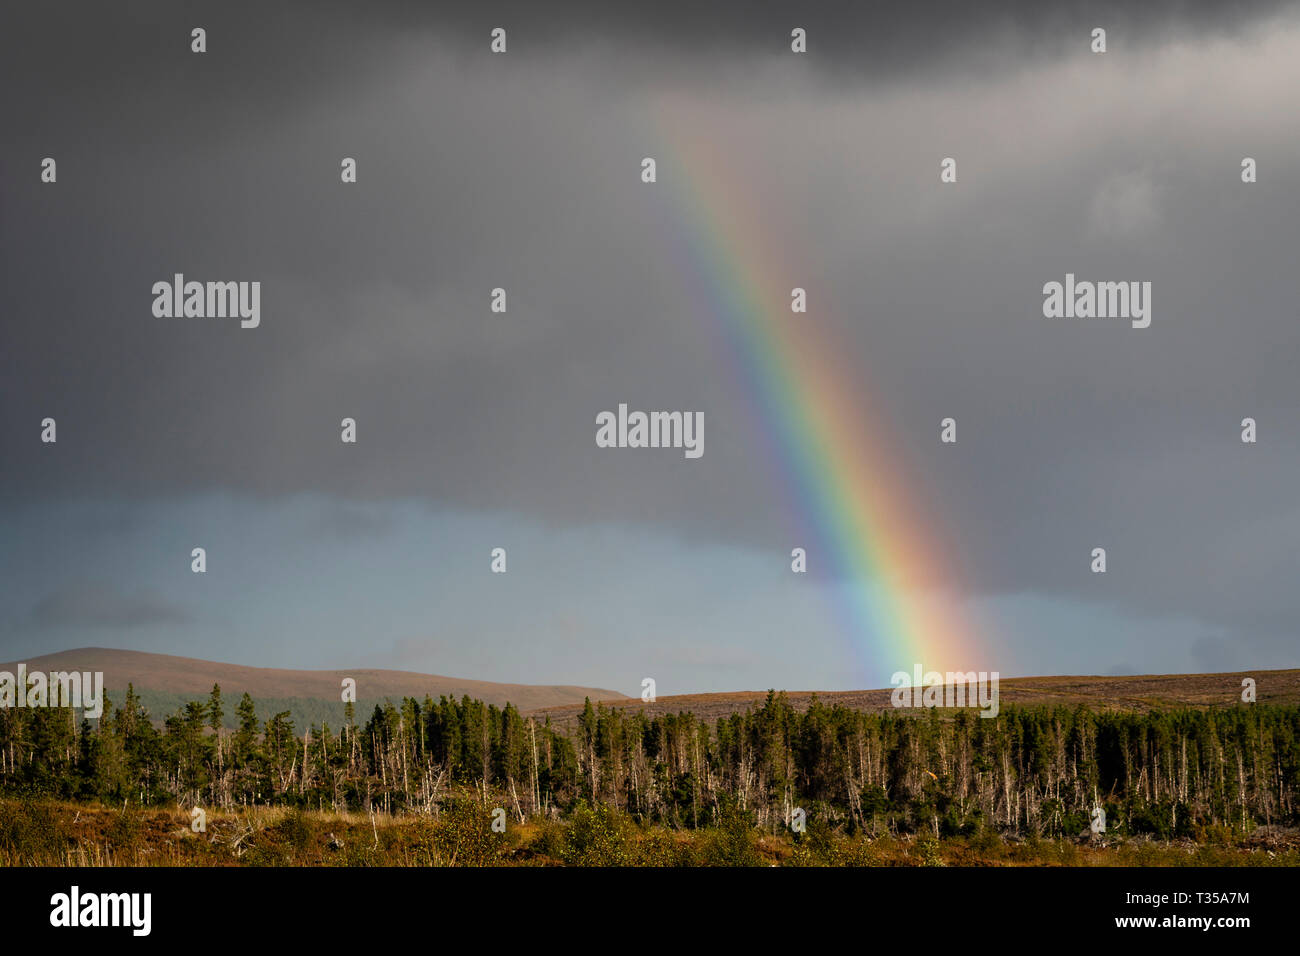 A vivid rainbow in northern Scotland. - Stock Image